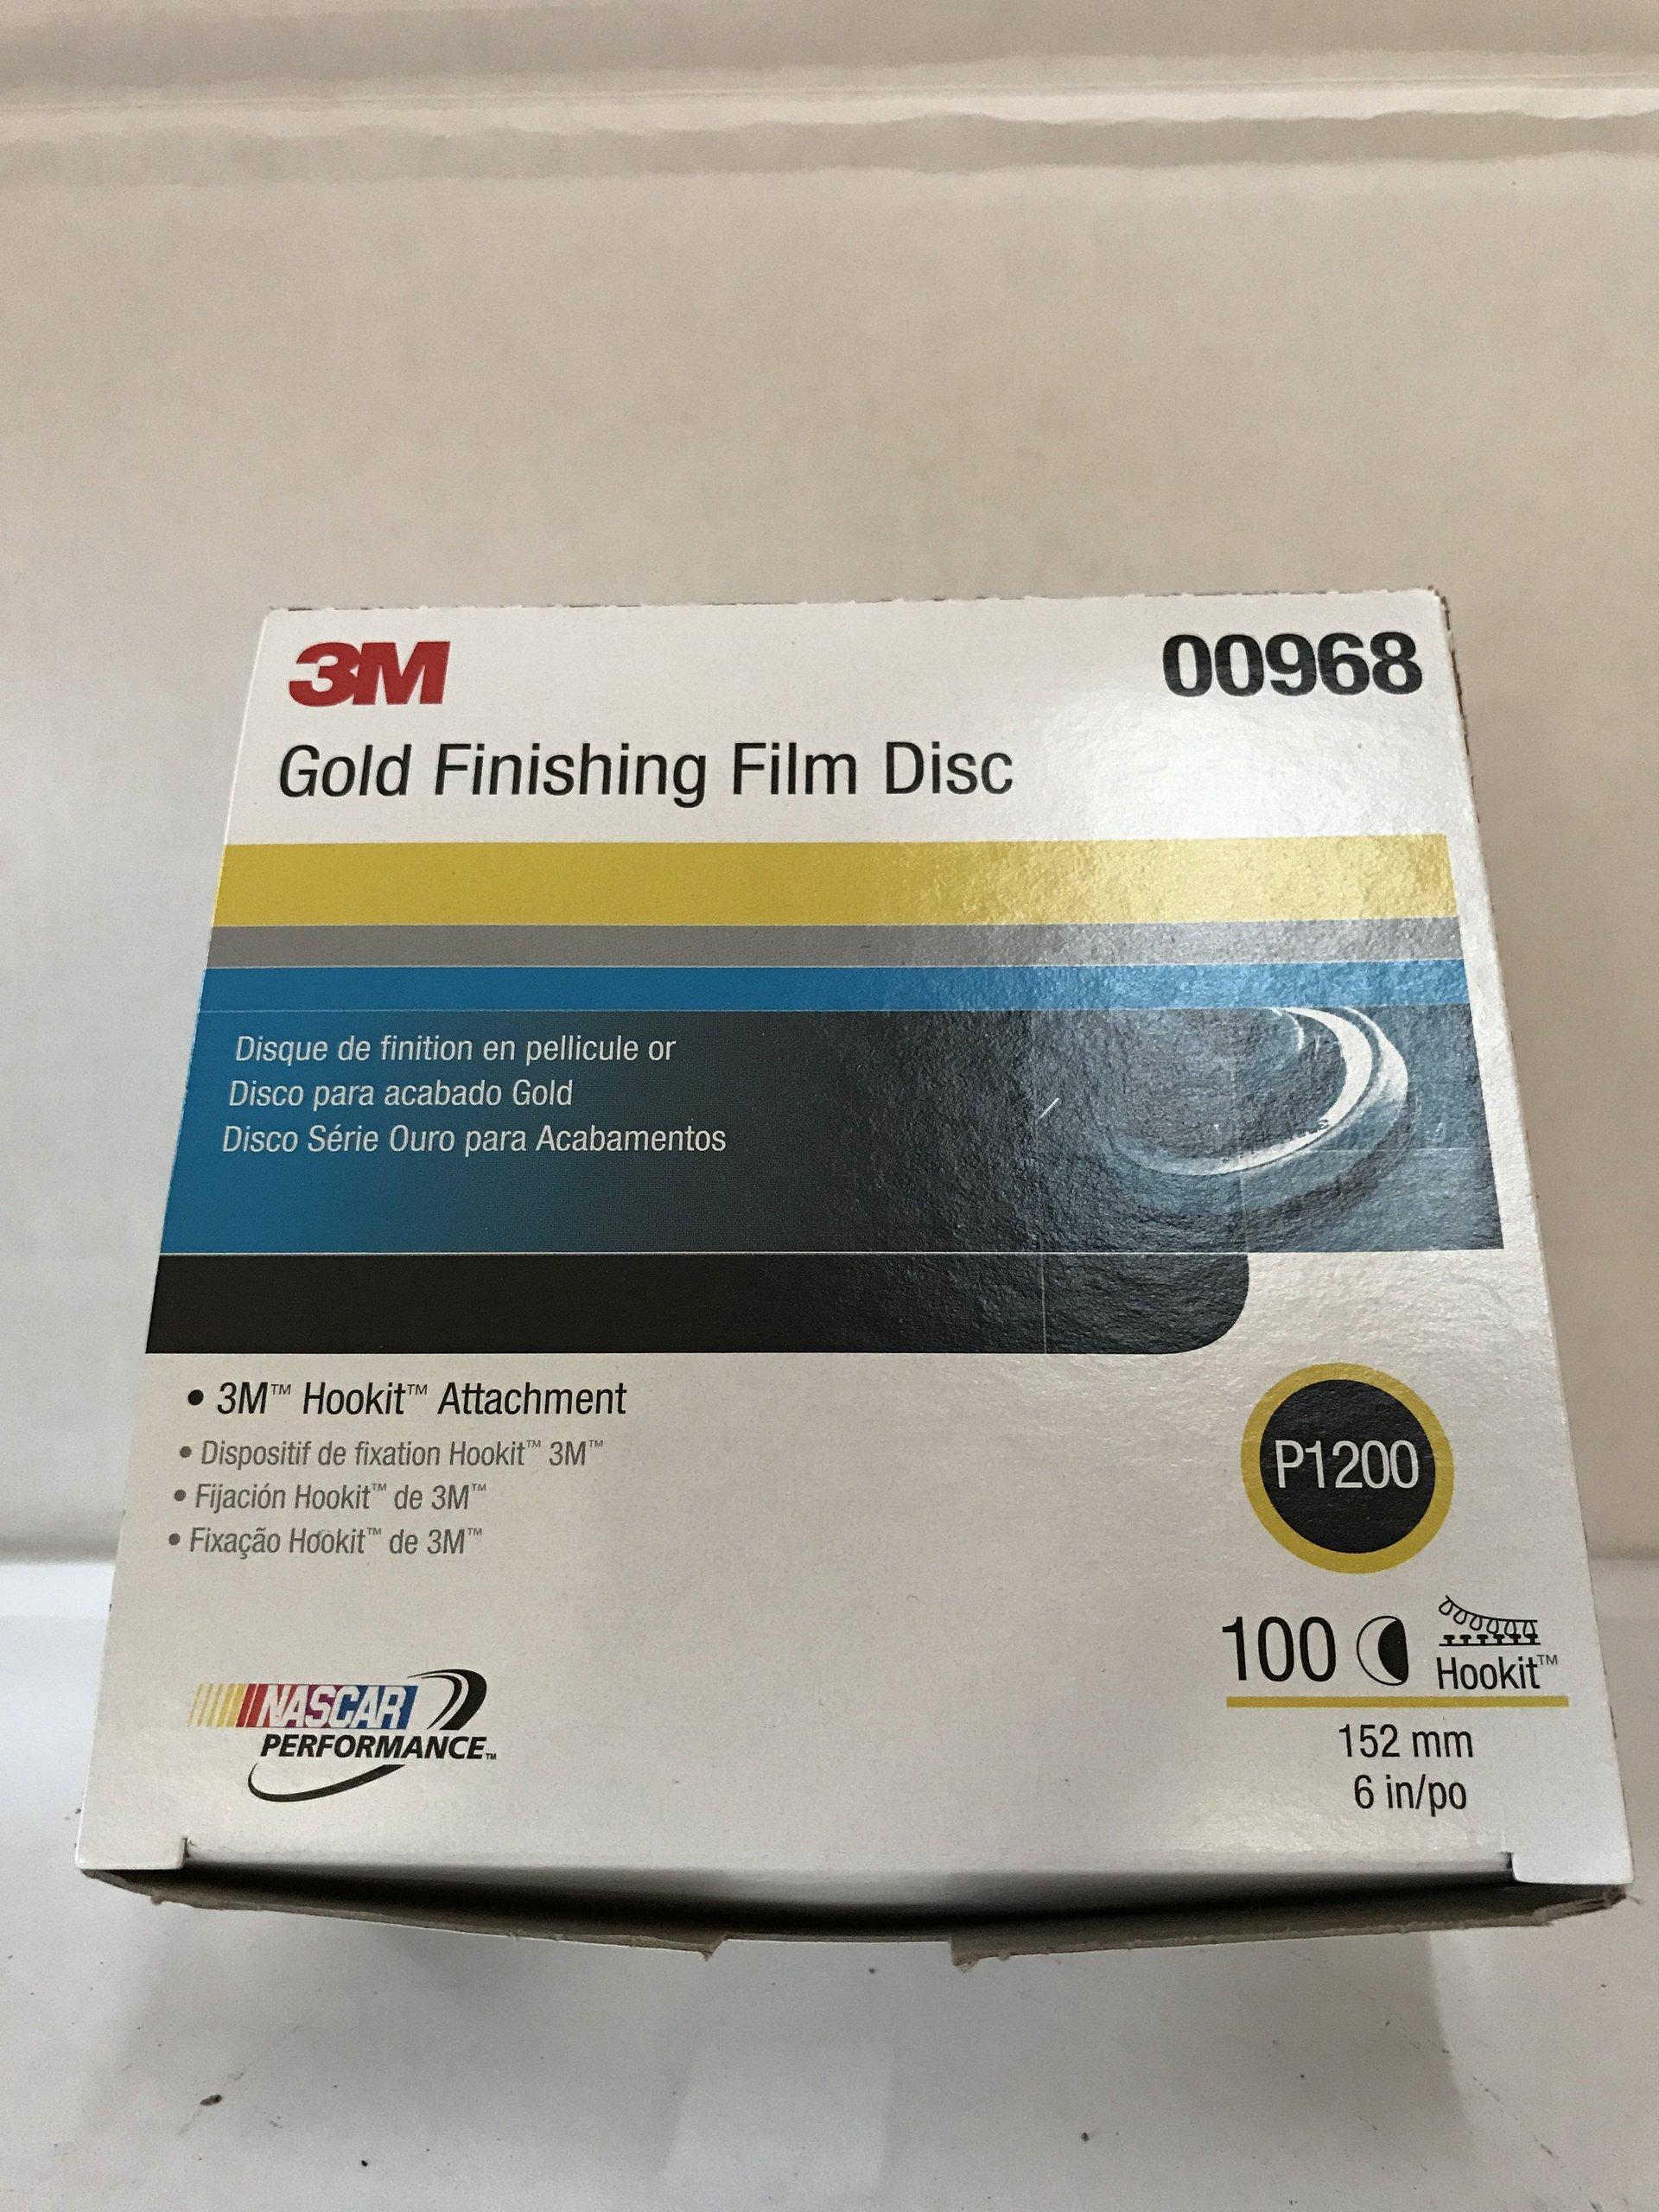 00968 3M GOLD FINISHING FILM DISC